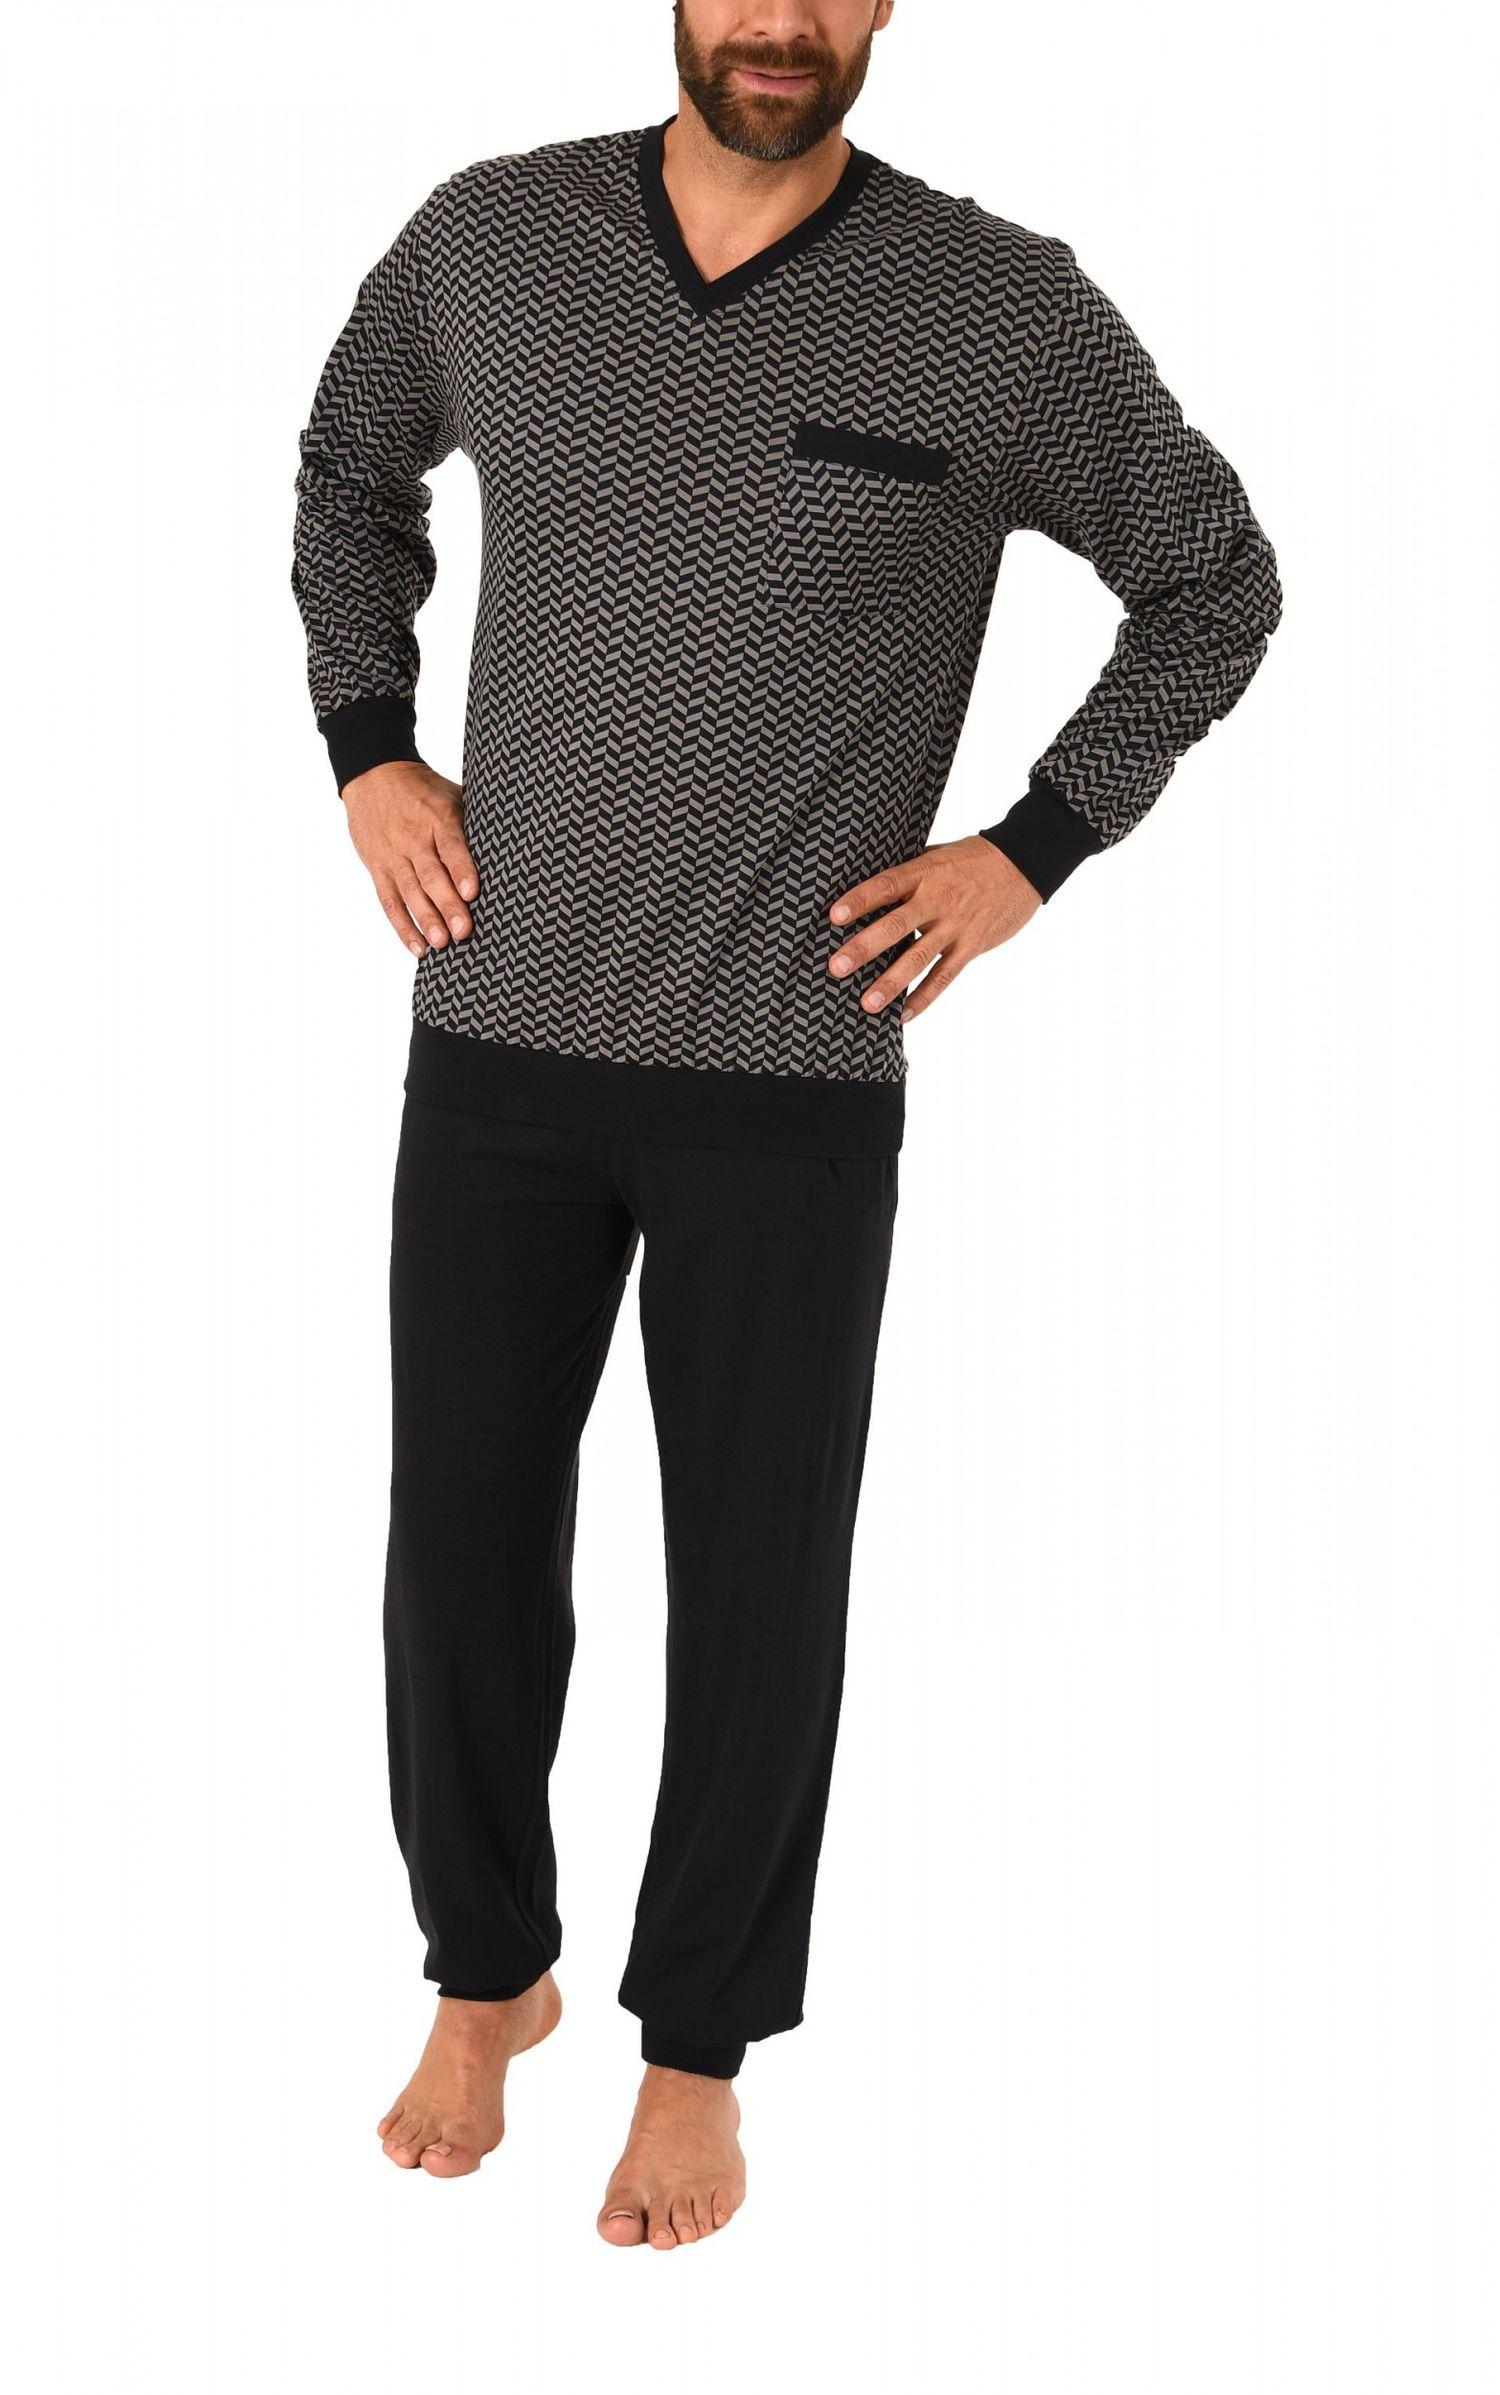 Edler Herren Pyjama Schlafanzug langarm mit Bündchen 61699 – Bild 2